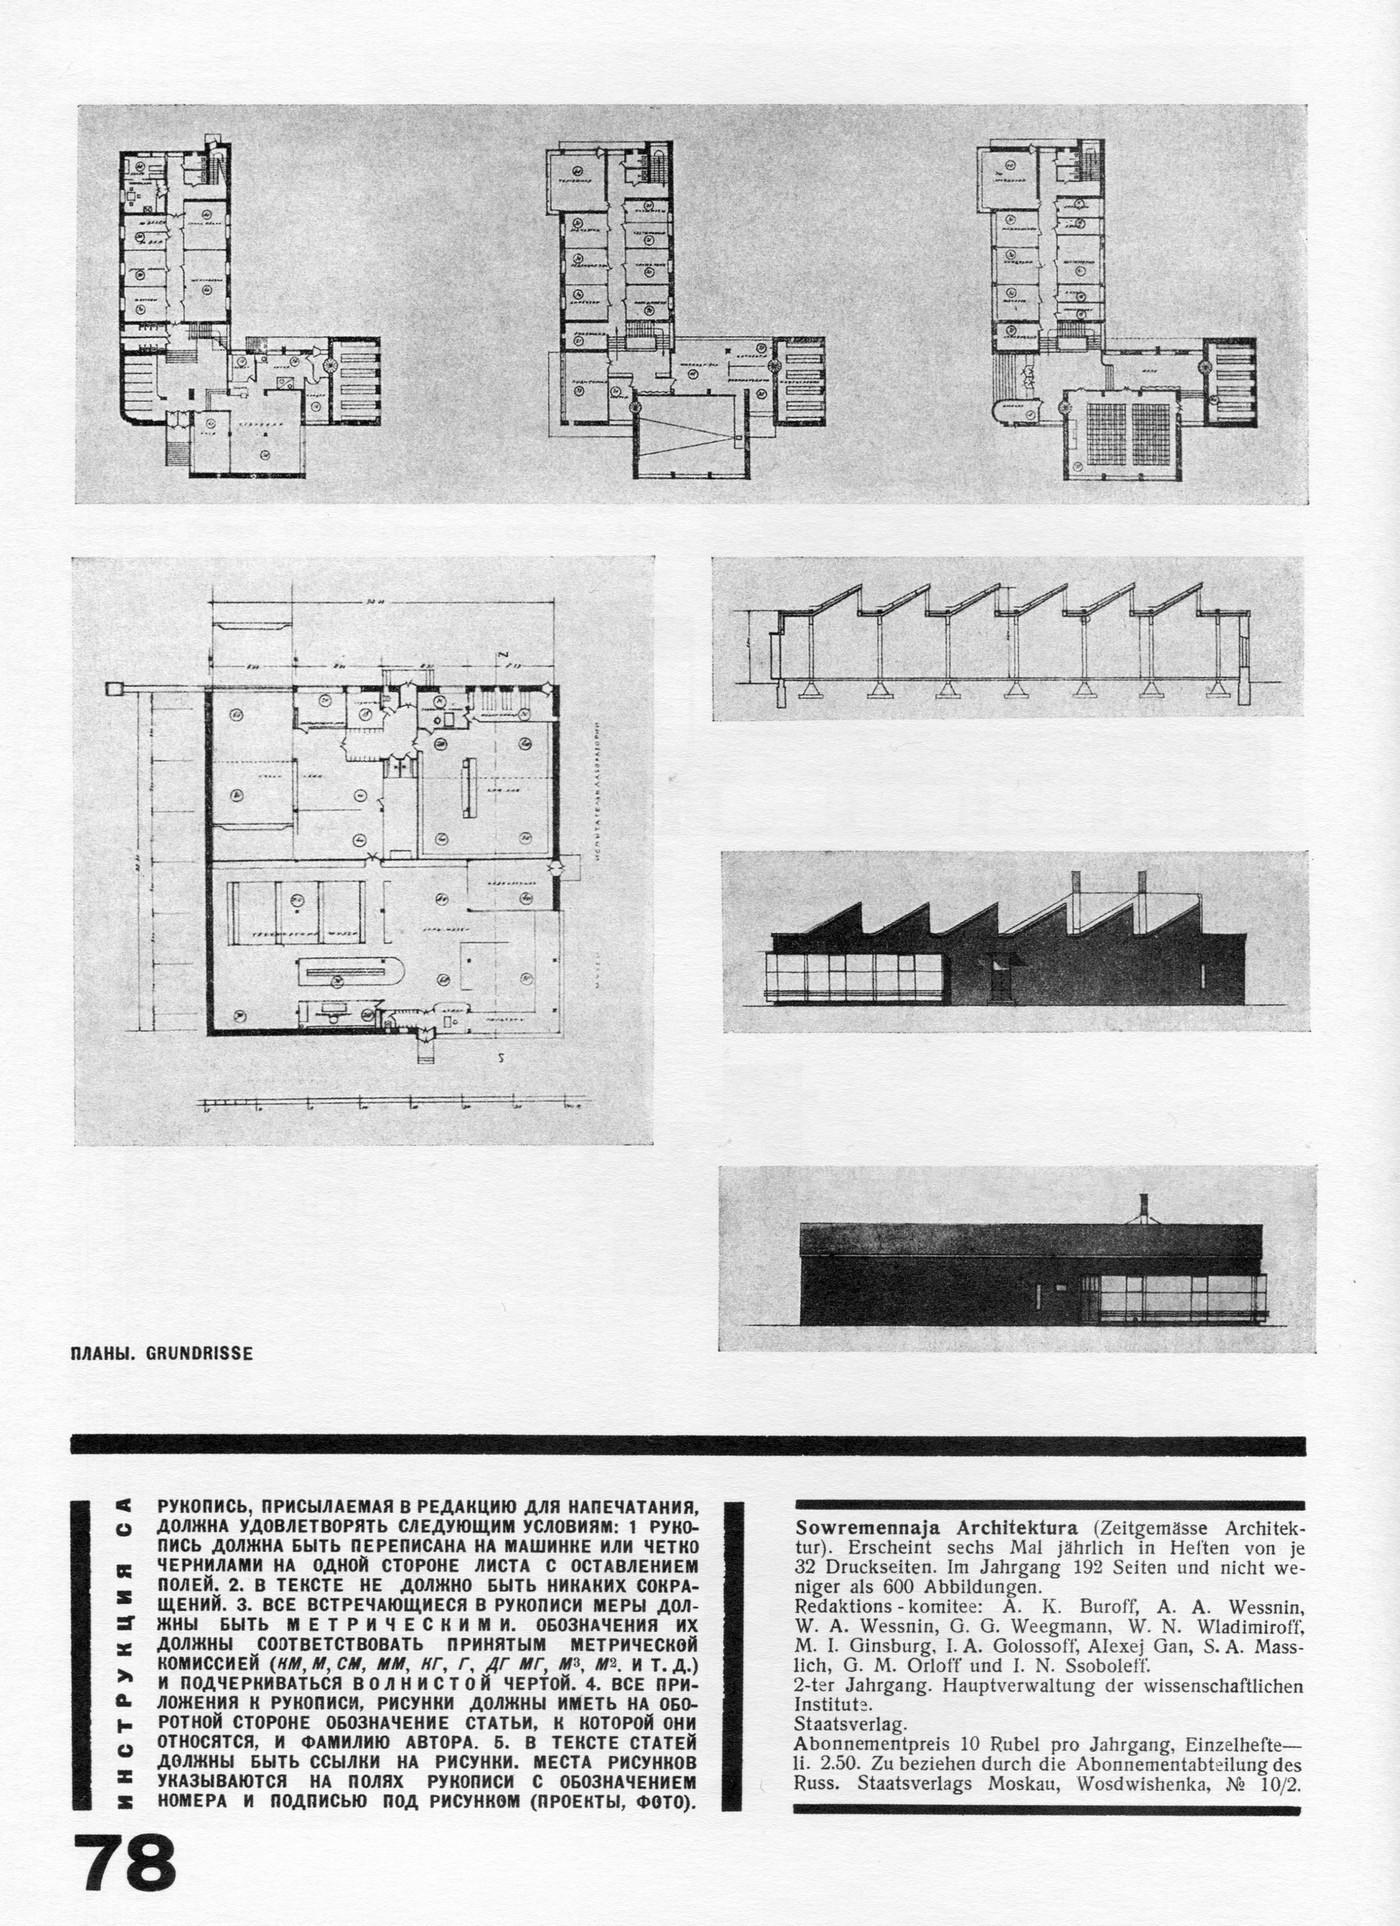 tehne.com-sa-1927-2-1400-034